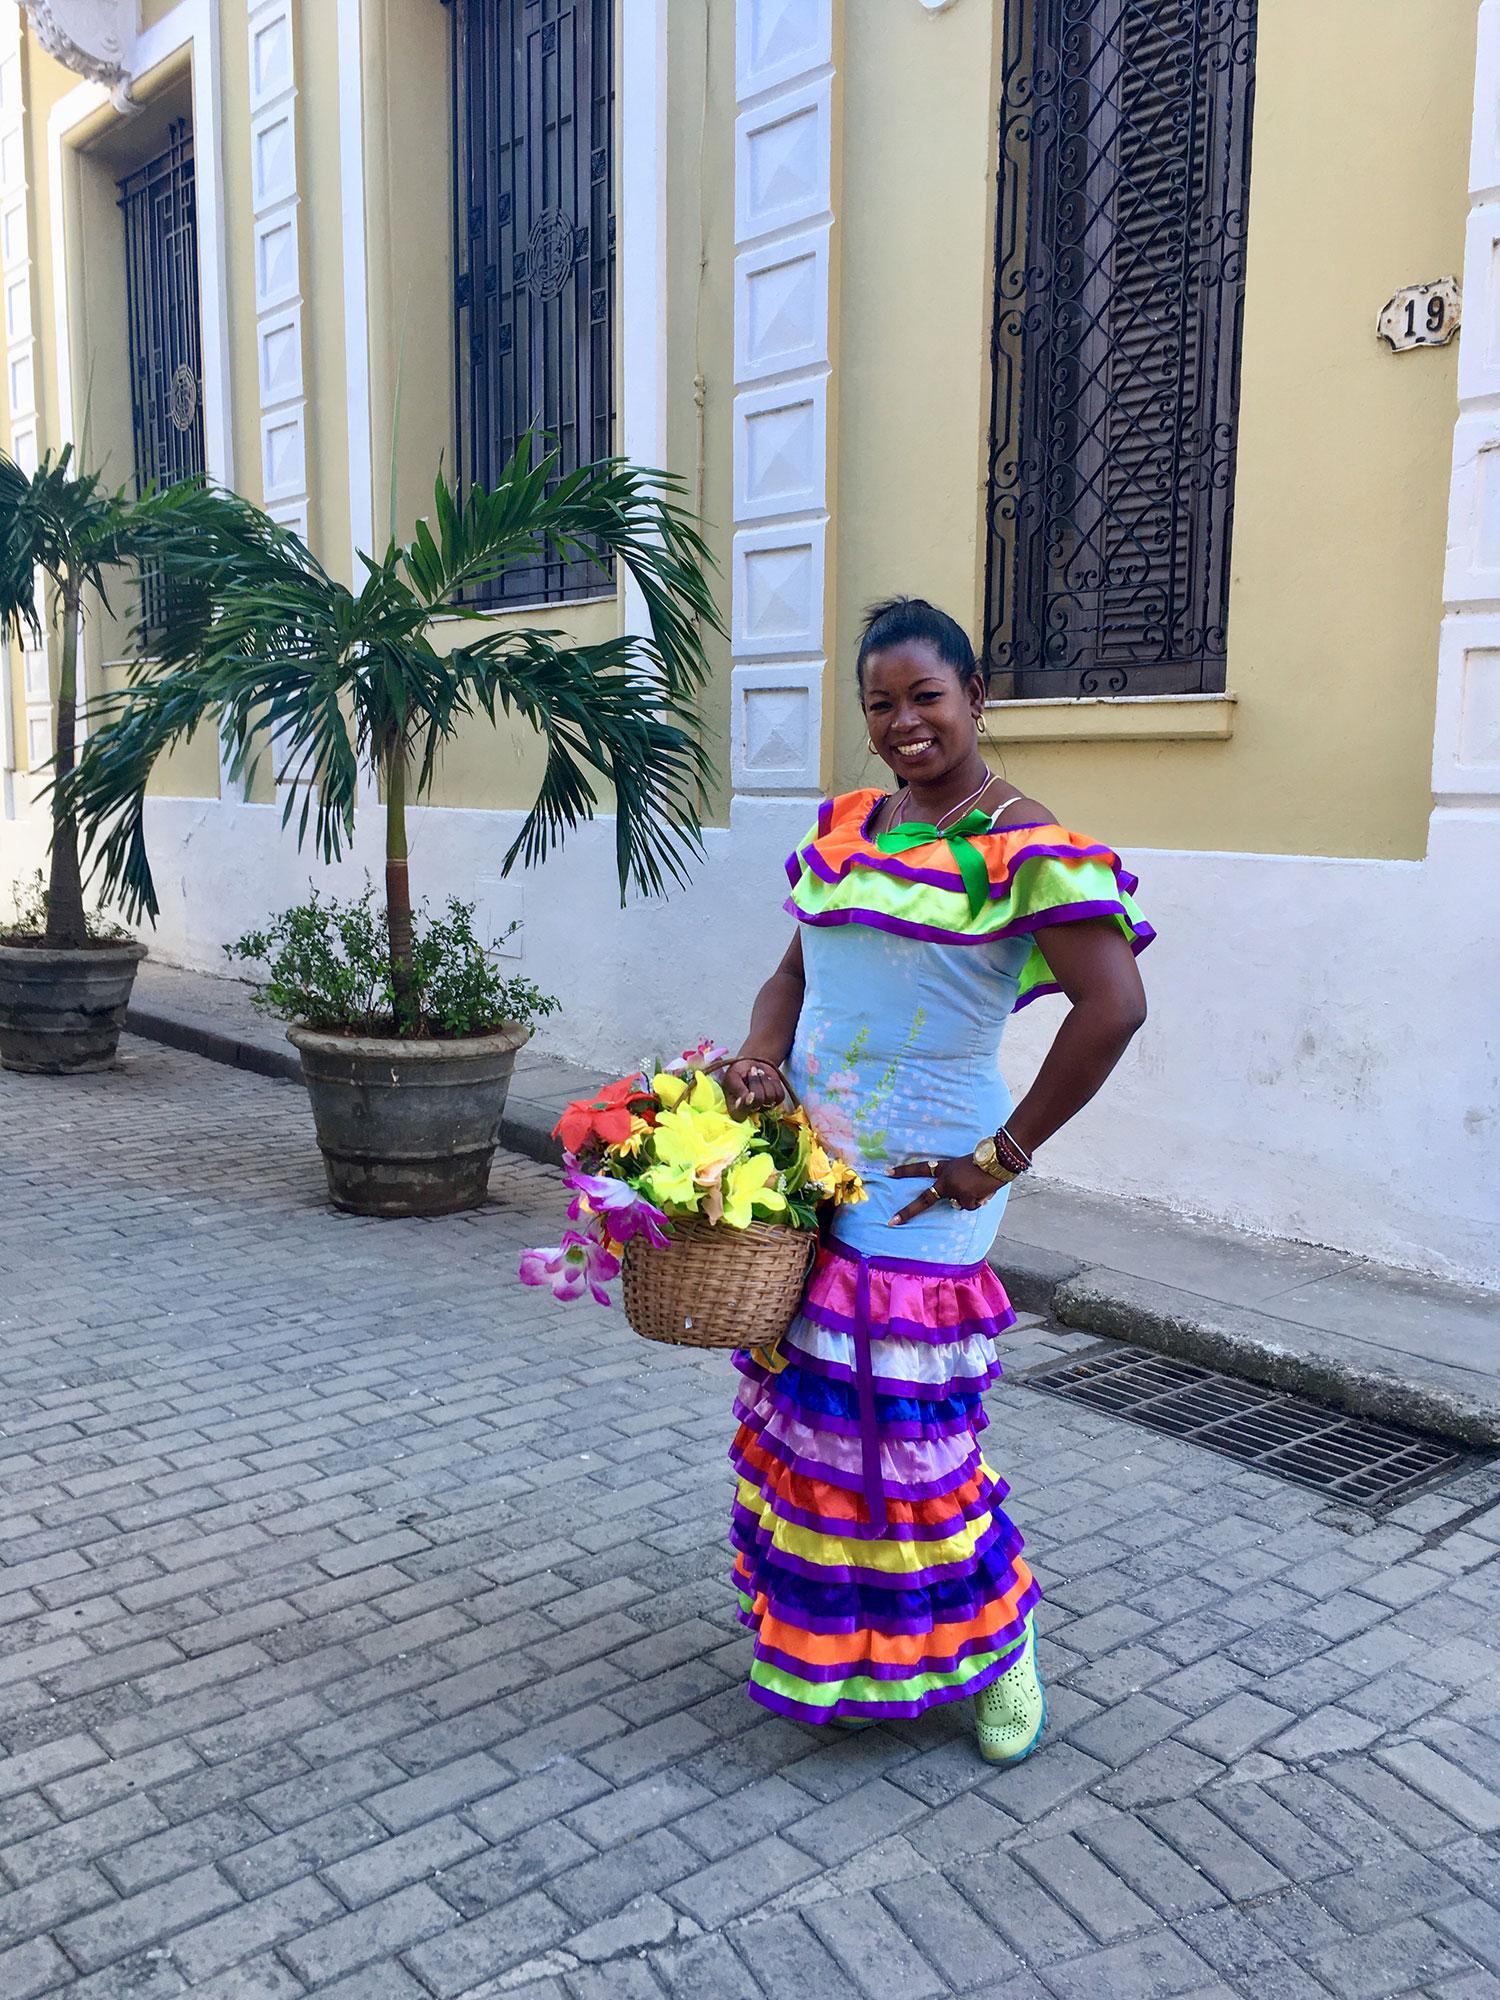 Hammocks_and_Ruins_What_to_Do_Cuba_Havana_island_socialist_27.jpg